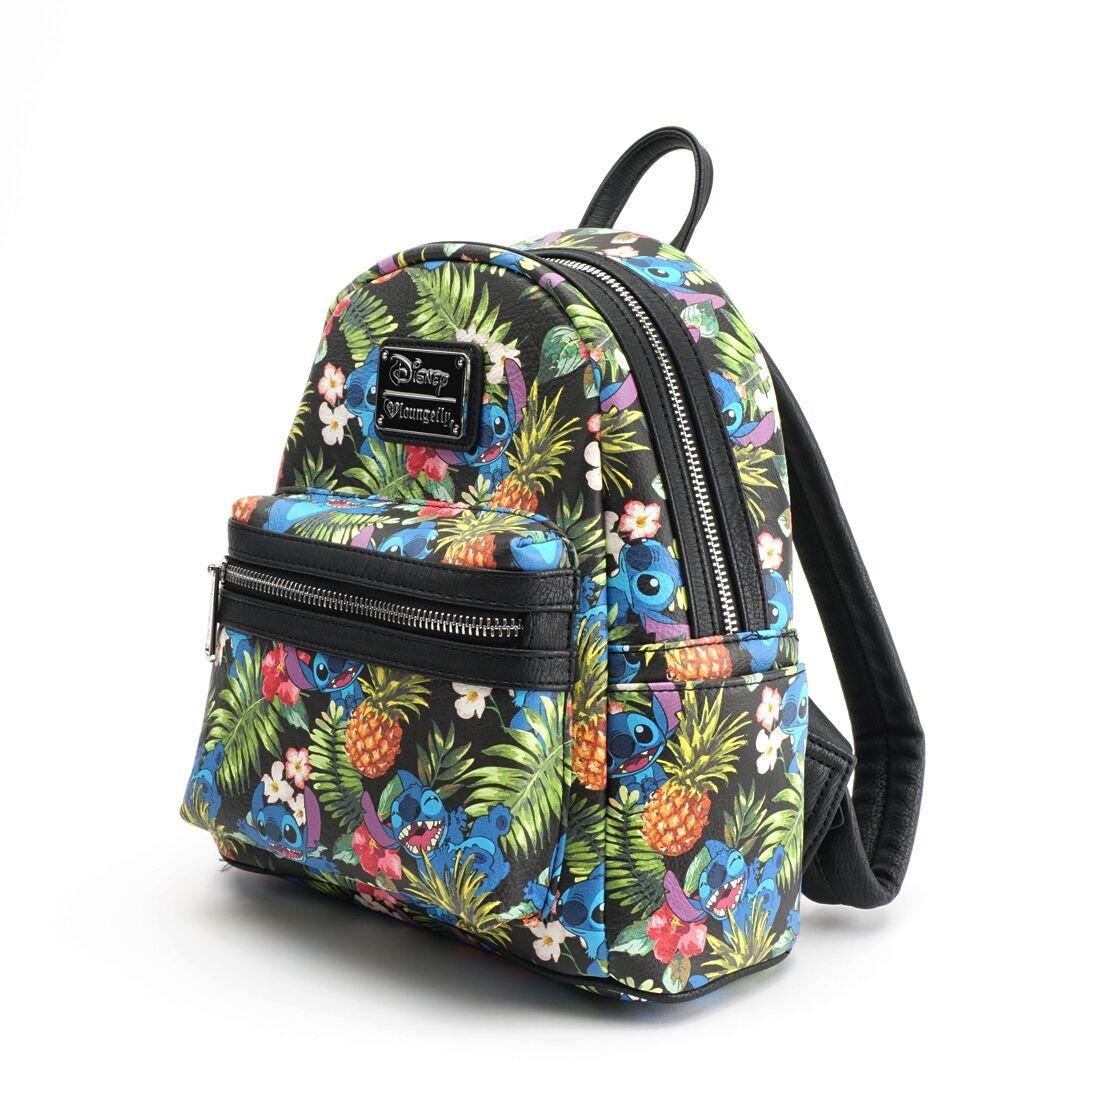 b9c442ca0a5 Loungefly Mini Backpack Amazon- Fenix Toulouse Handball